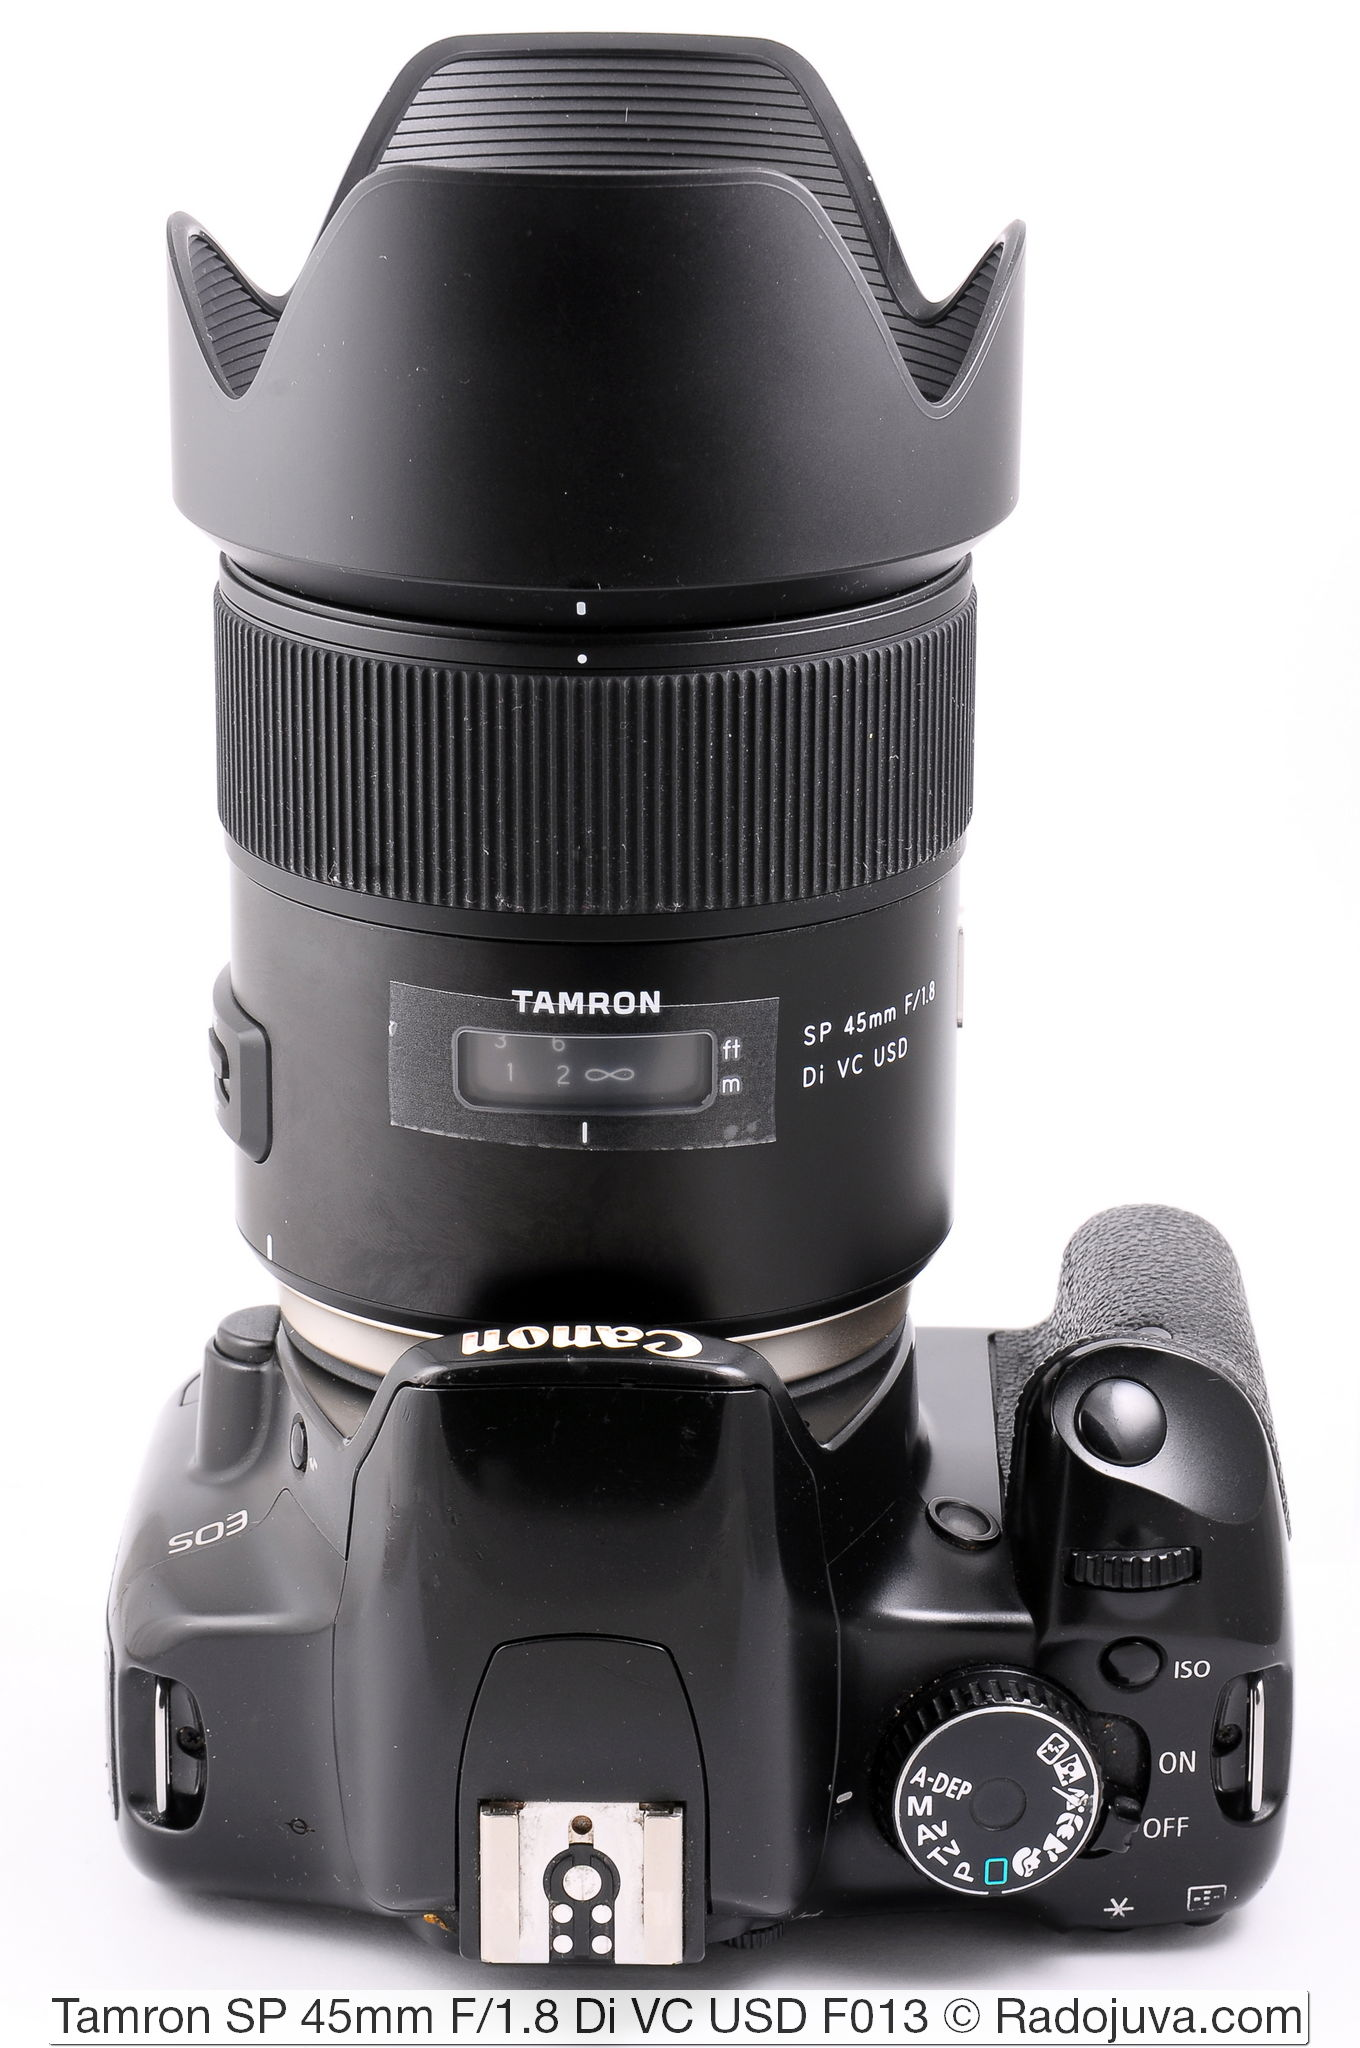 F013 Lens Hood Universal 67mm black for Tamron SP 45 mm F1.8 Di VC USD